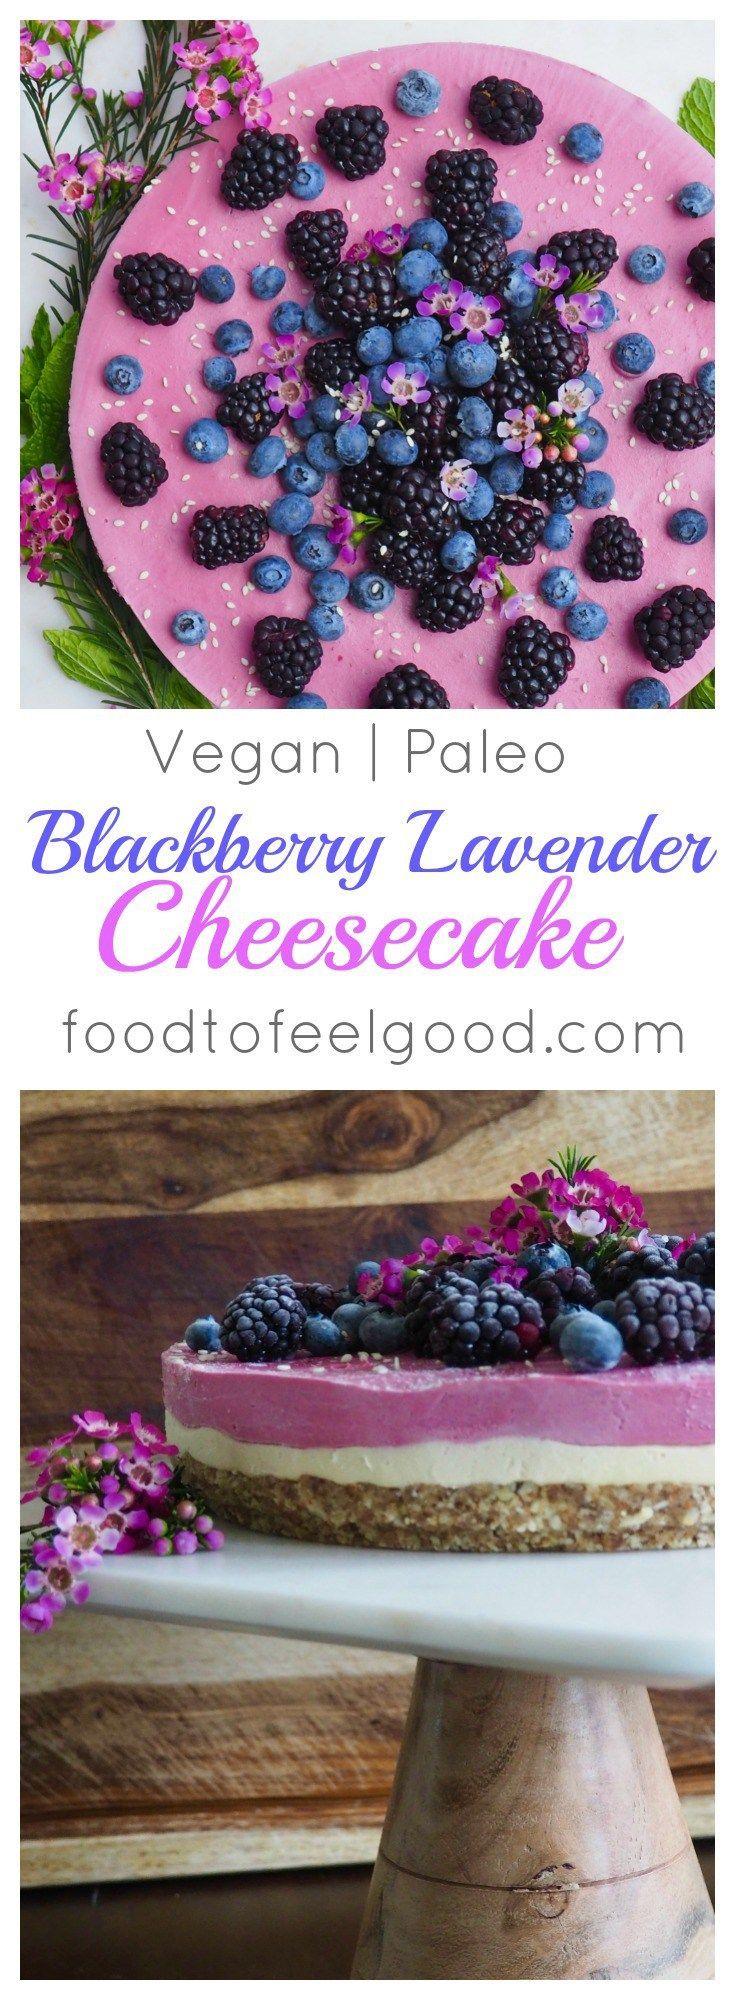 Raw Vegan Paleo Blackberry Lavender Cheescake recipe